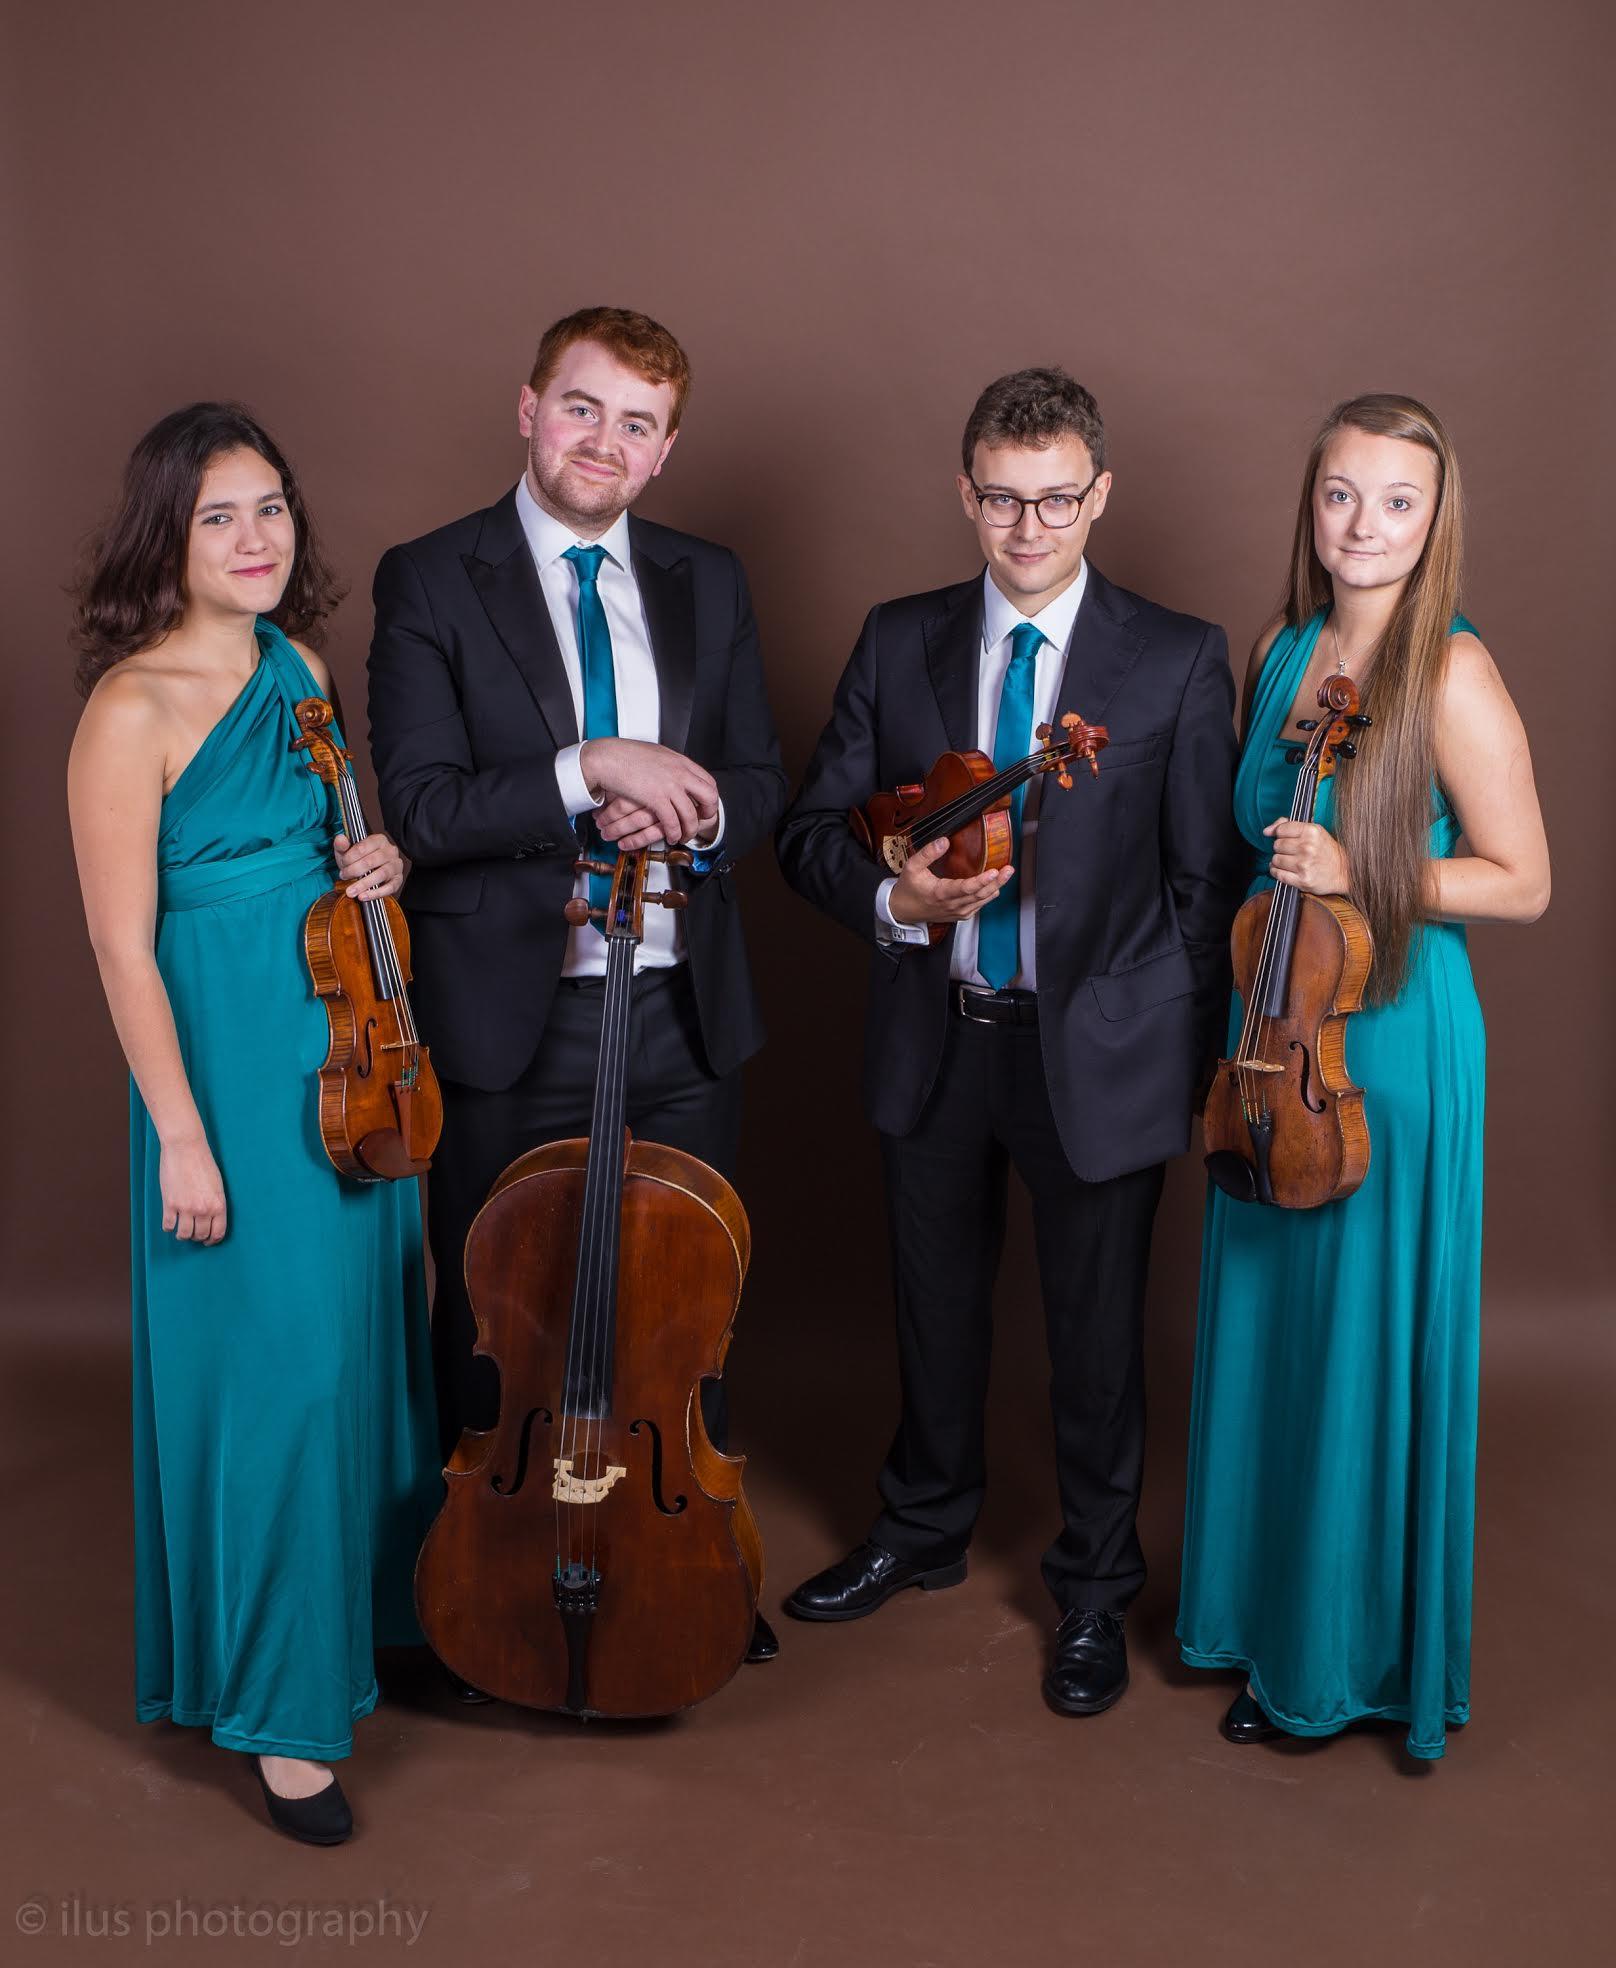 Concert of the Fitzroy Quartet